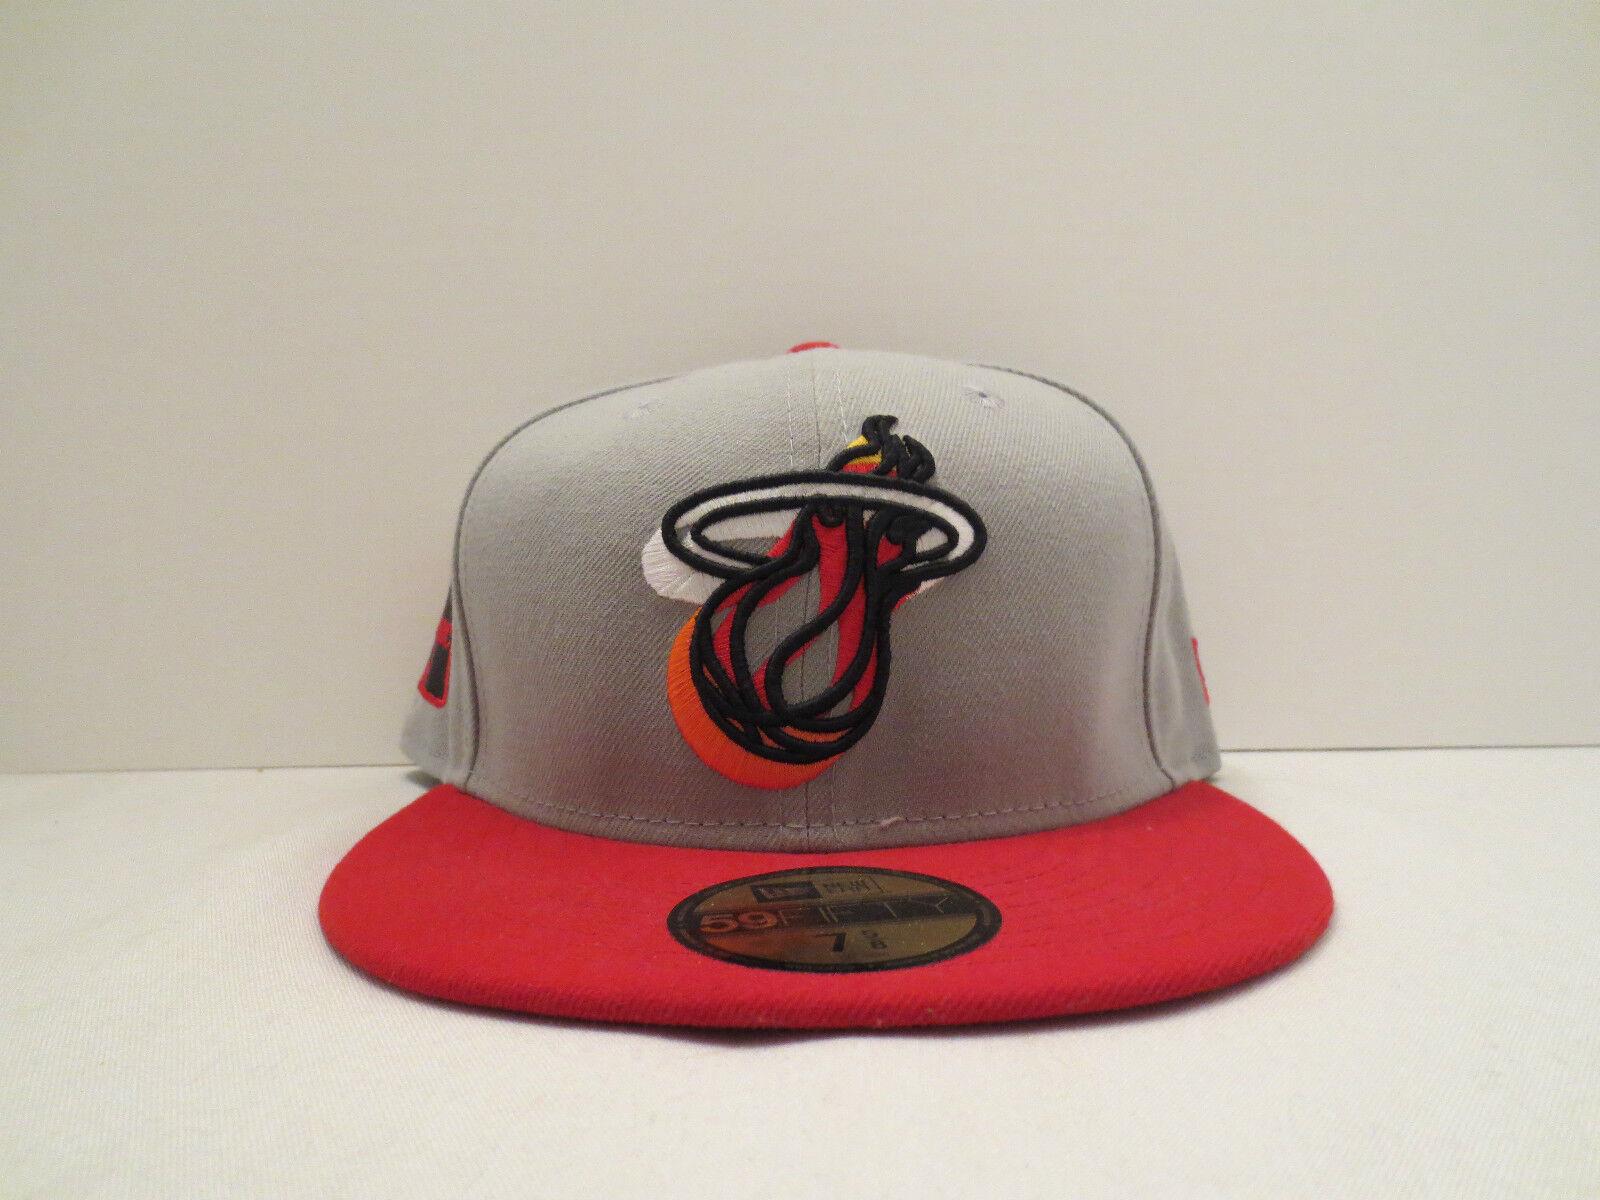 NEW ERA NBA MIAMI HEAT NEON LOGO POP CAP FITTED CAP POP HAT SIZE 7 3/4 NWT GREY RED NWT 5da5e1